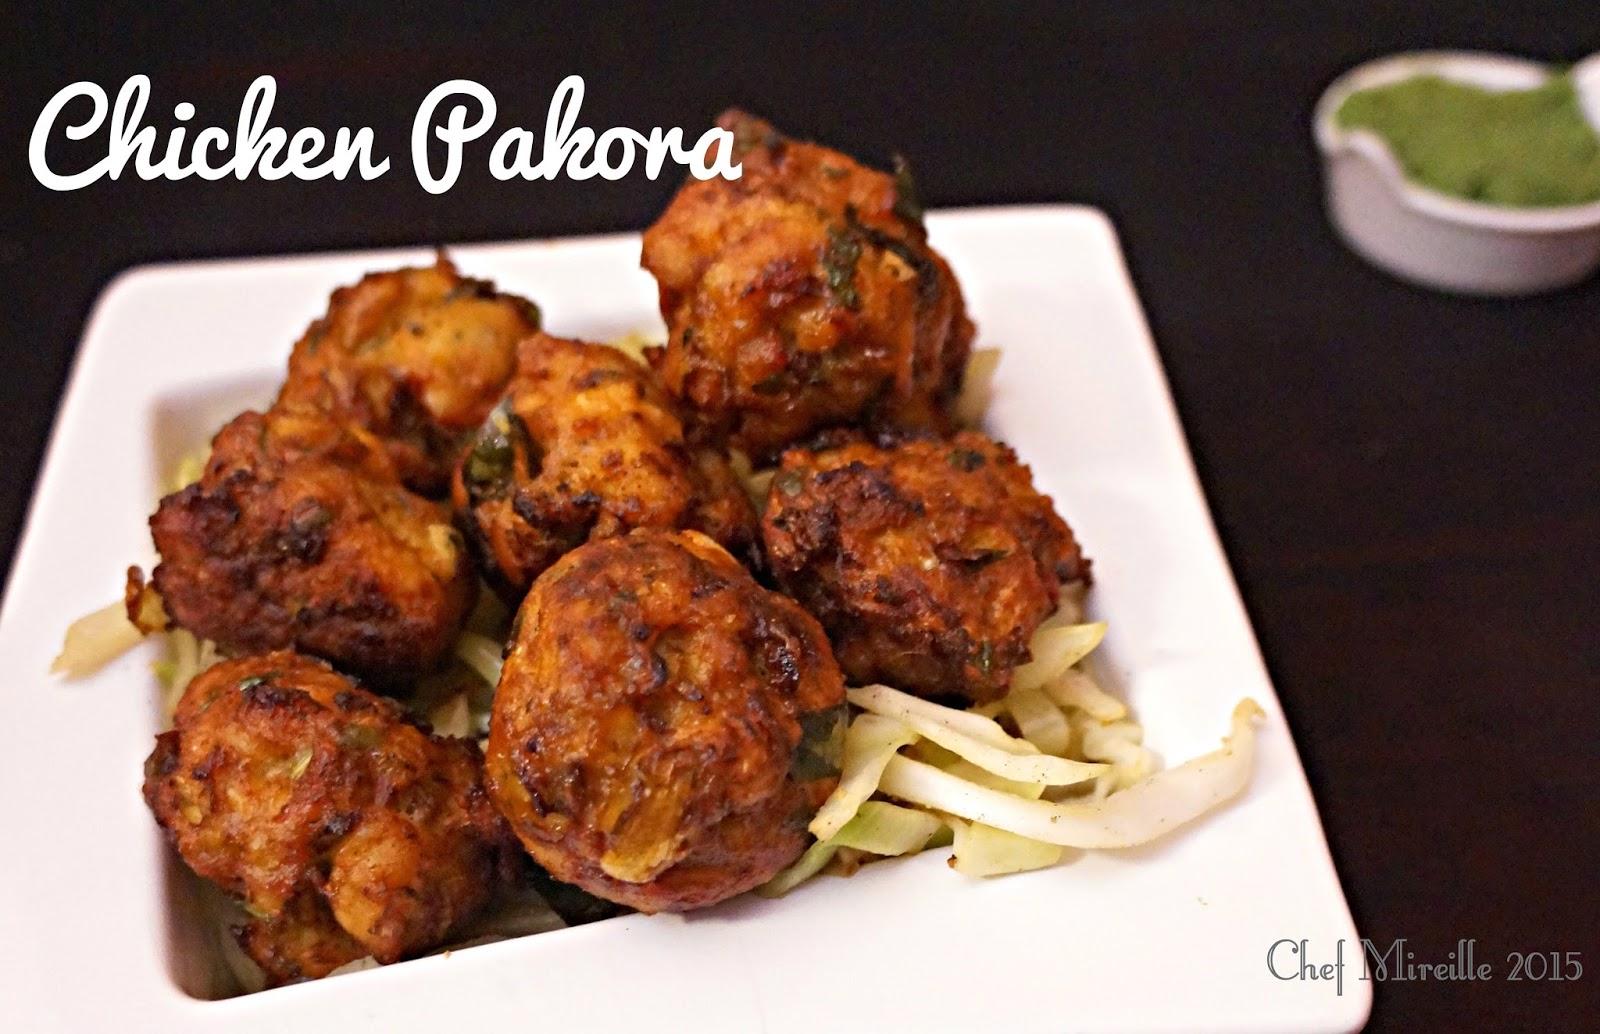 Chicken Meatballs from www.eastwestrealm.com